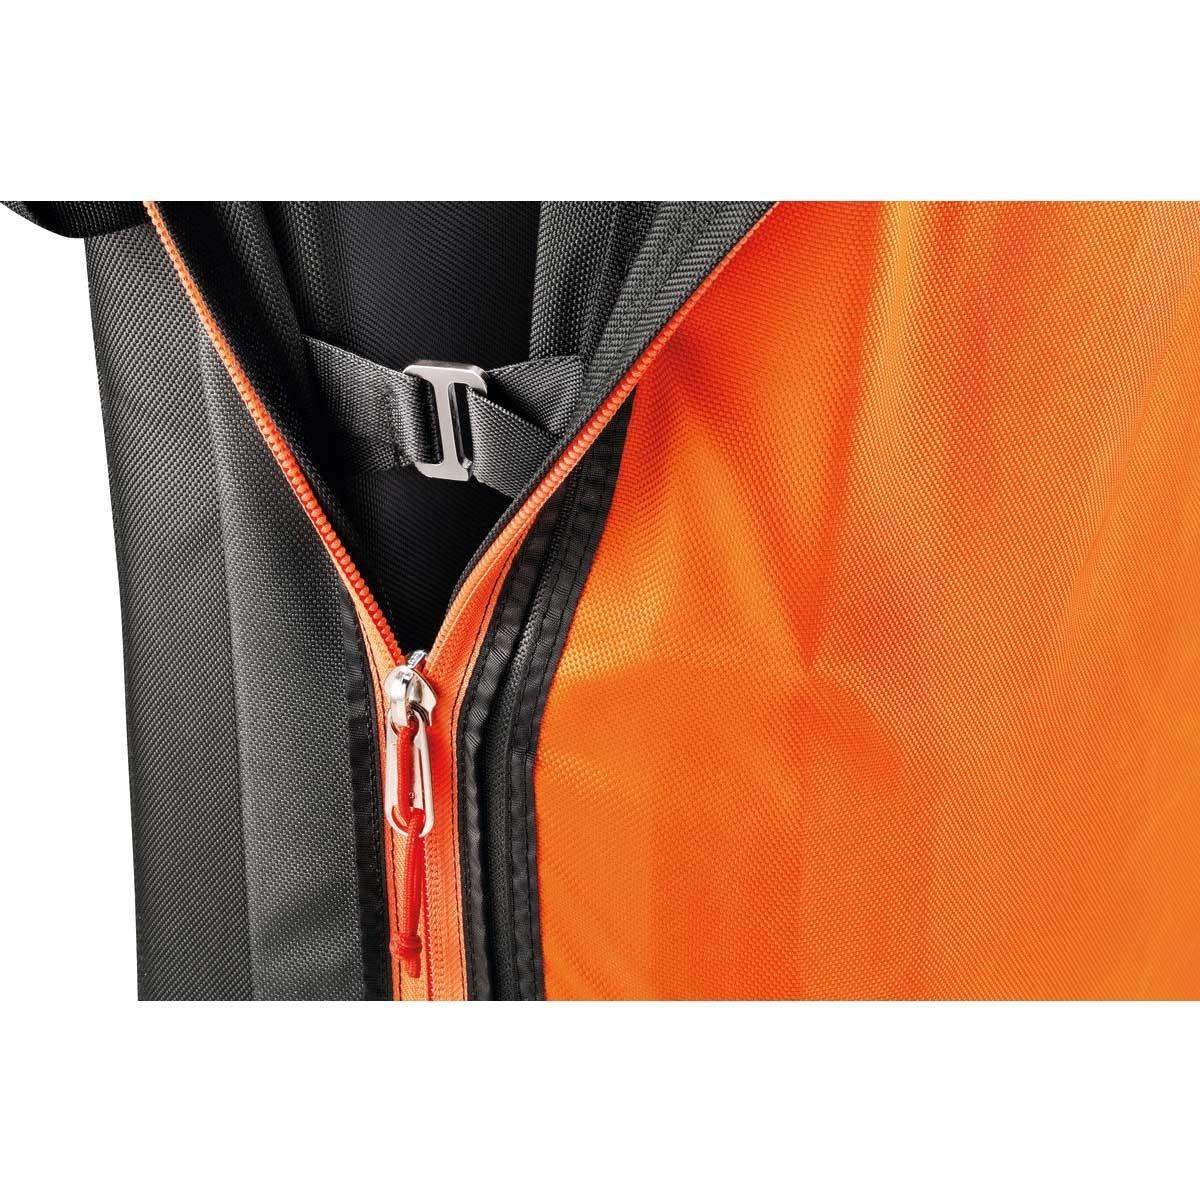 Petzl Alto Bouldering Pad - Orange/Black